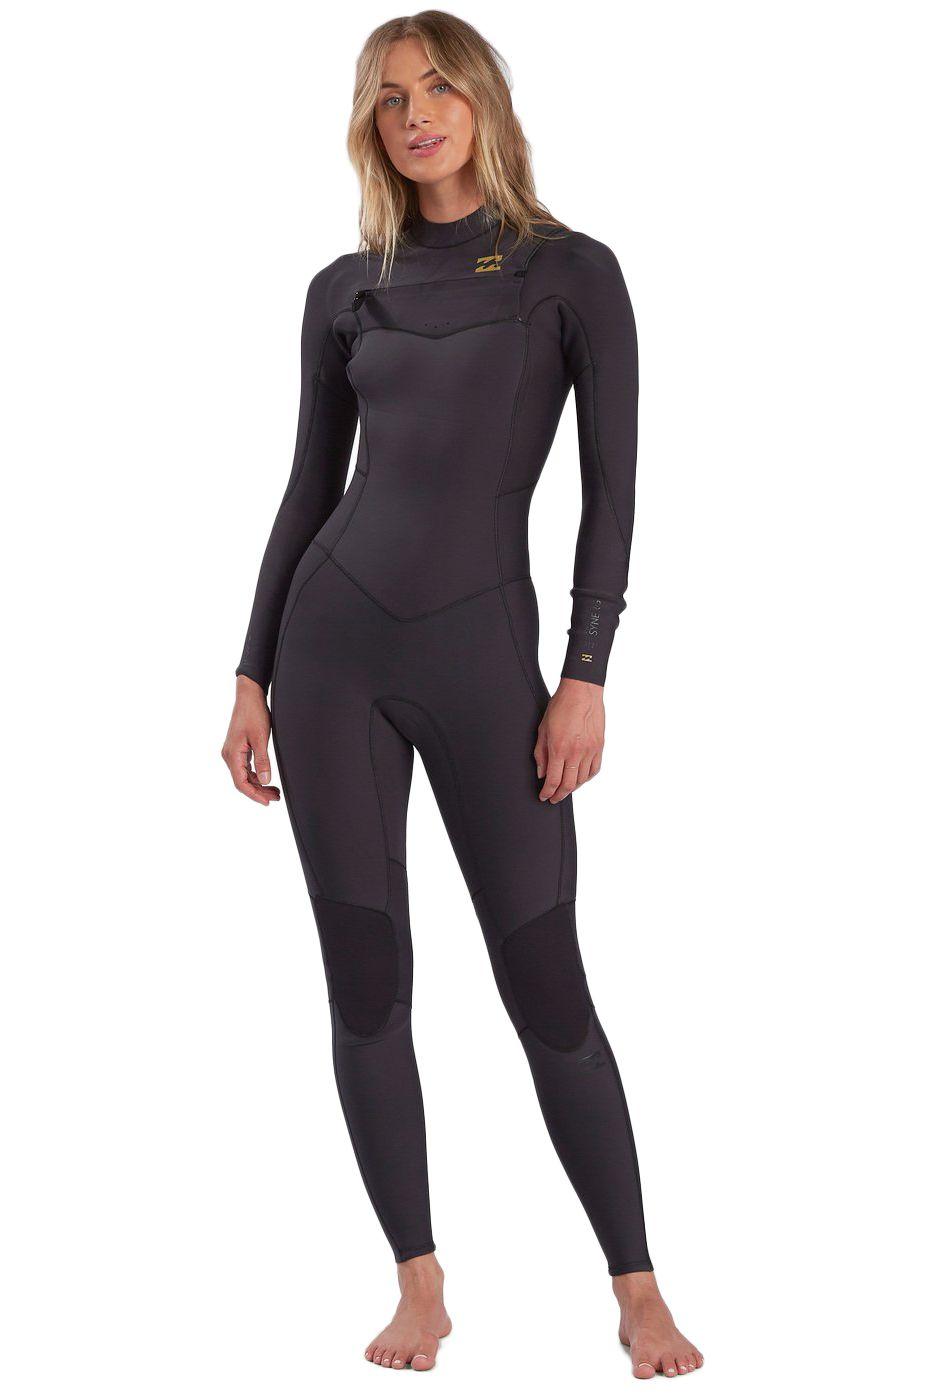 Billabong Wetsuit 403 SYNERGY CZ GBS F Black Tropic